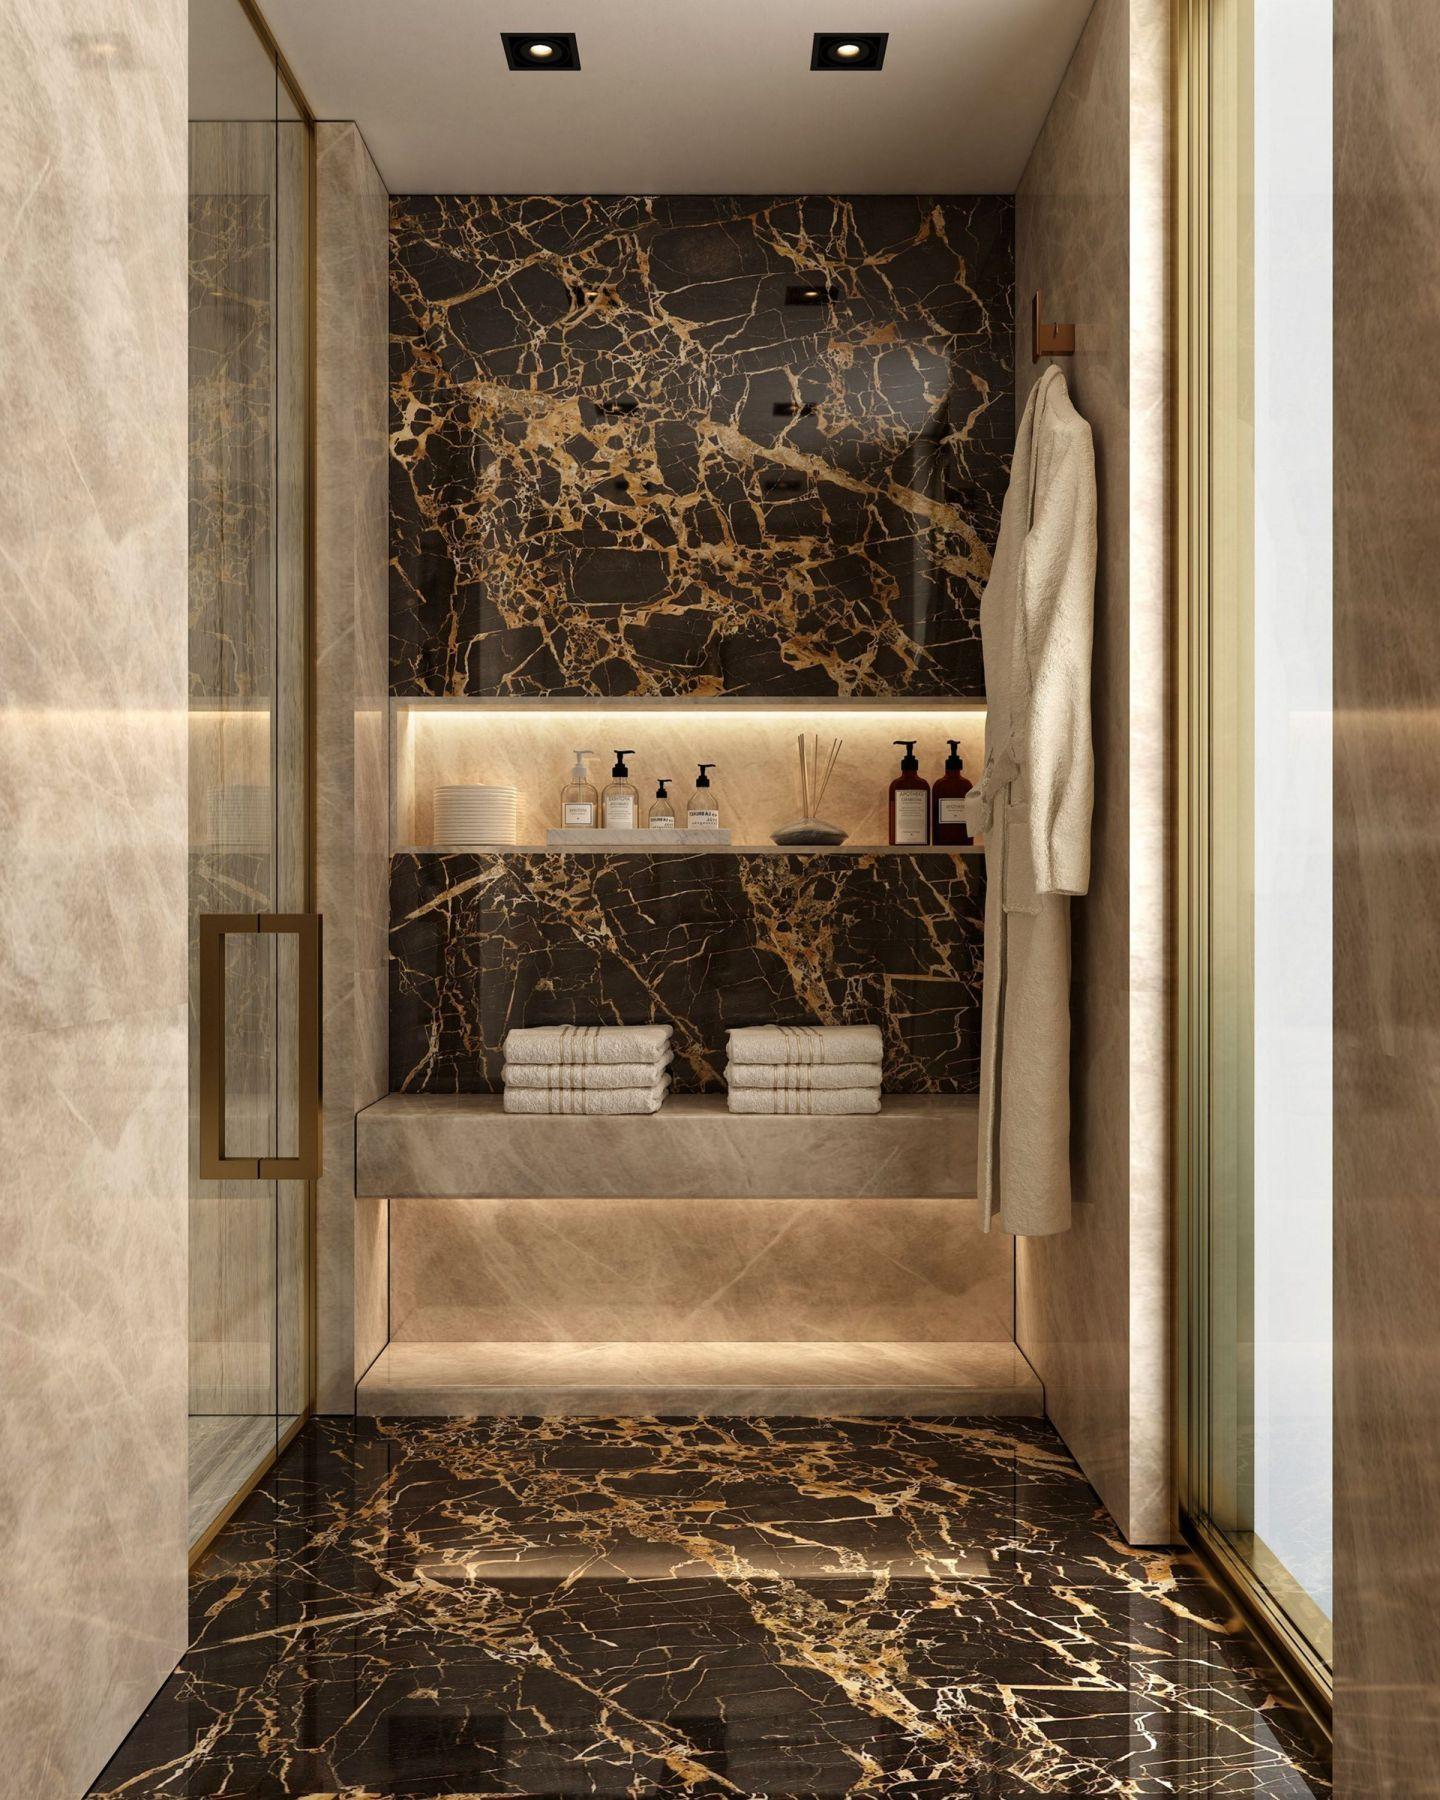 30 Glamorous Bathroom Design Ideas You Never Seen Before Bathroom Inspiration Modern Glamorous Bathroom Luxury Bathroom